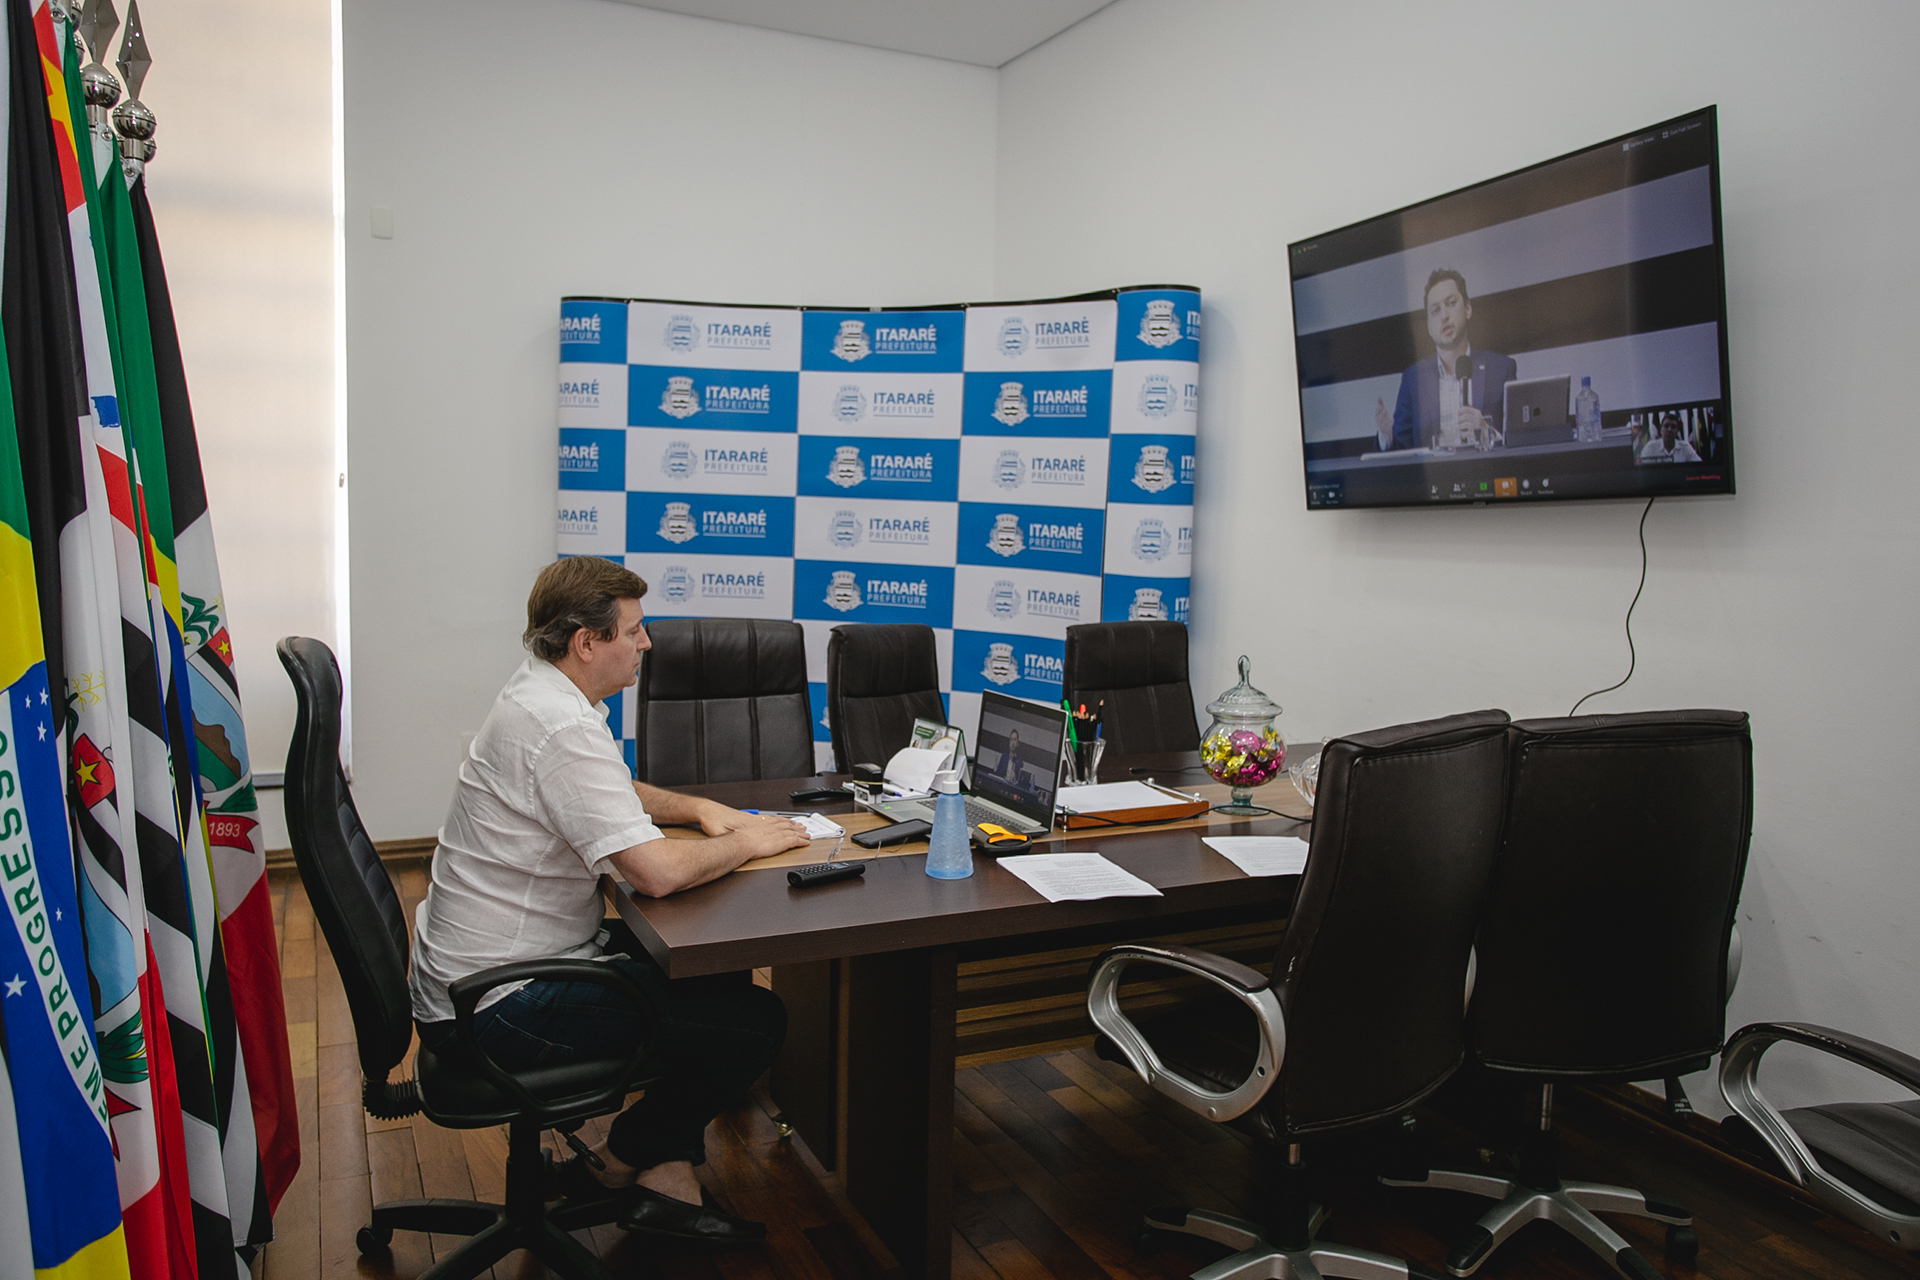 Coronavírus: Prefeito de Itararé (SP) participa de videoconferência com vice-governador